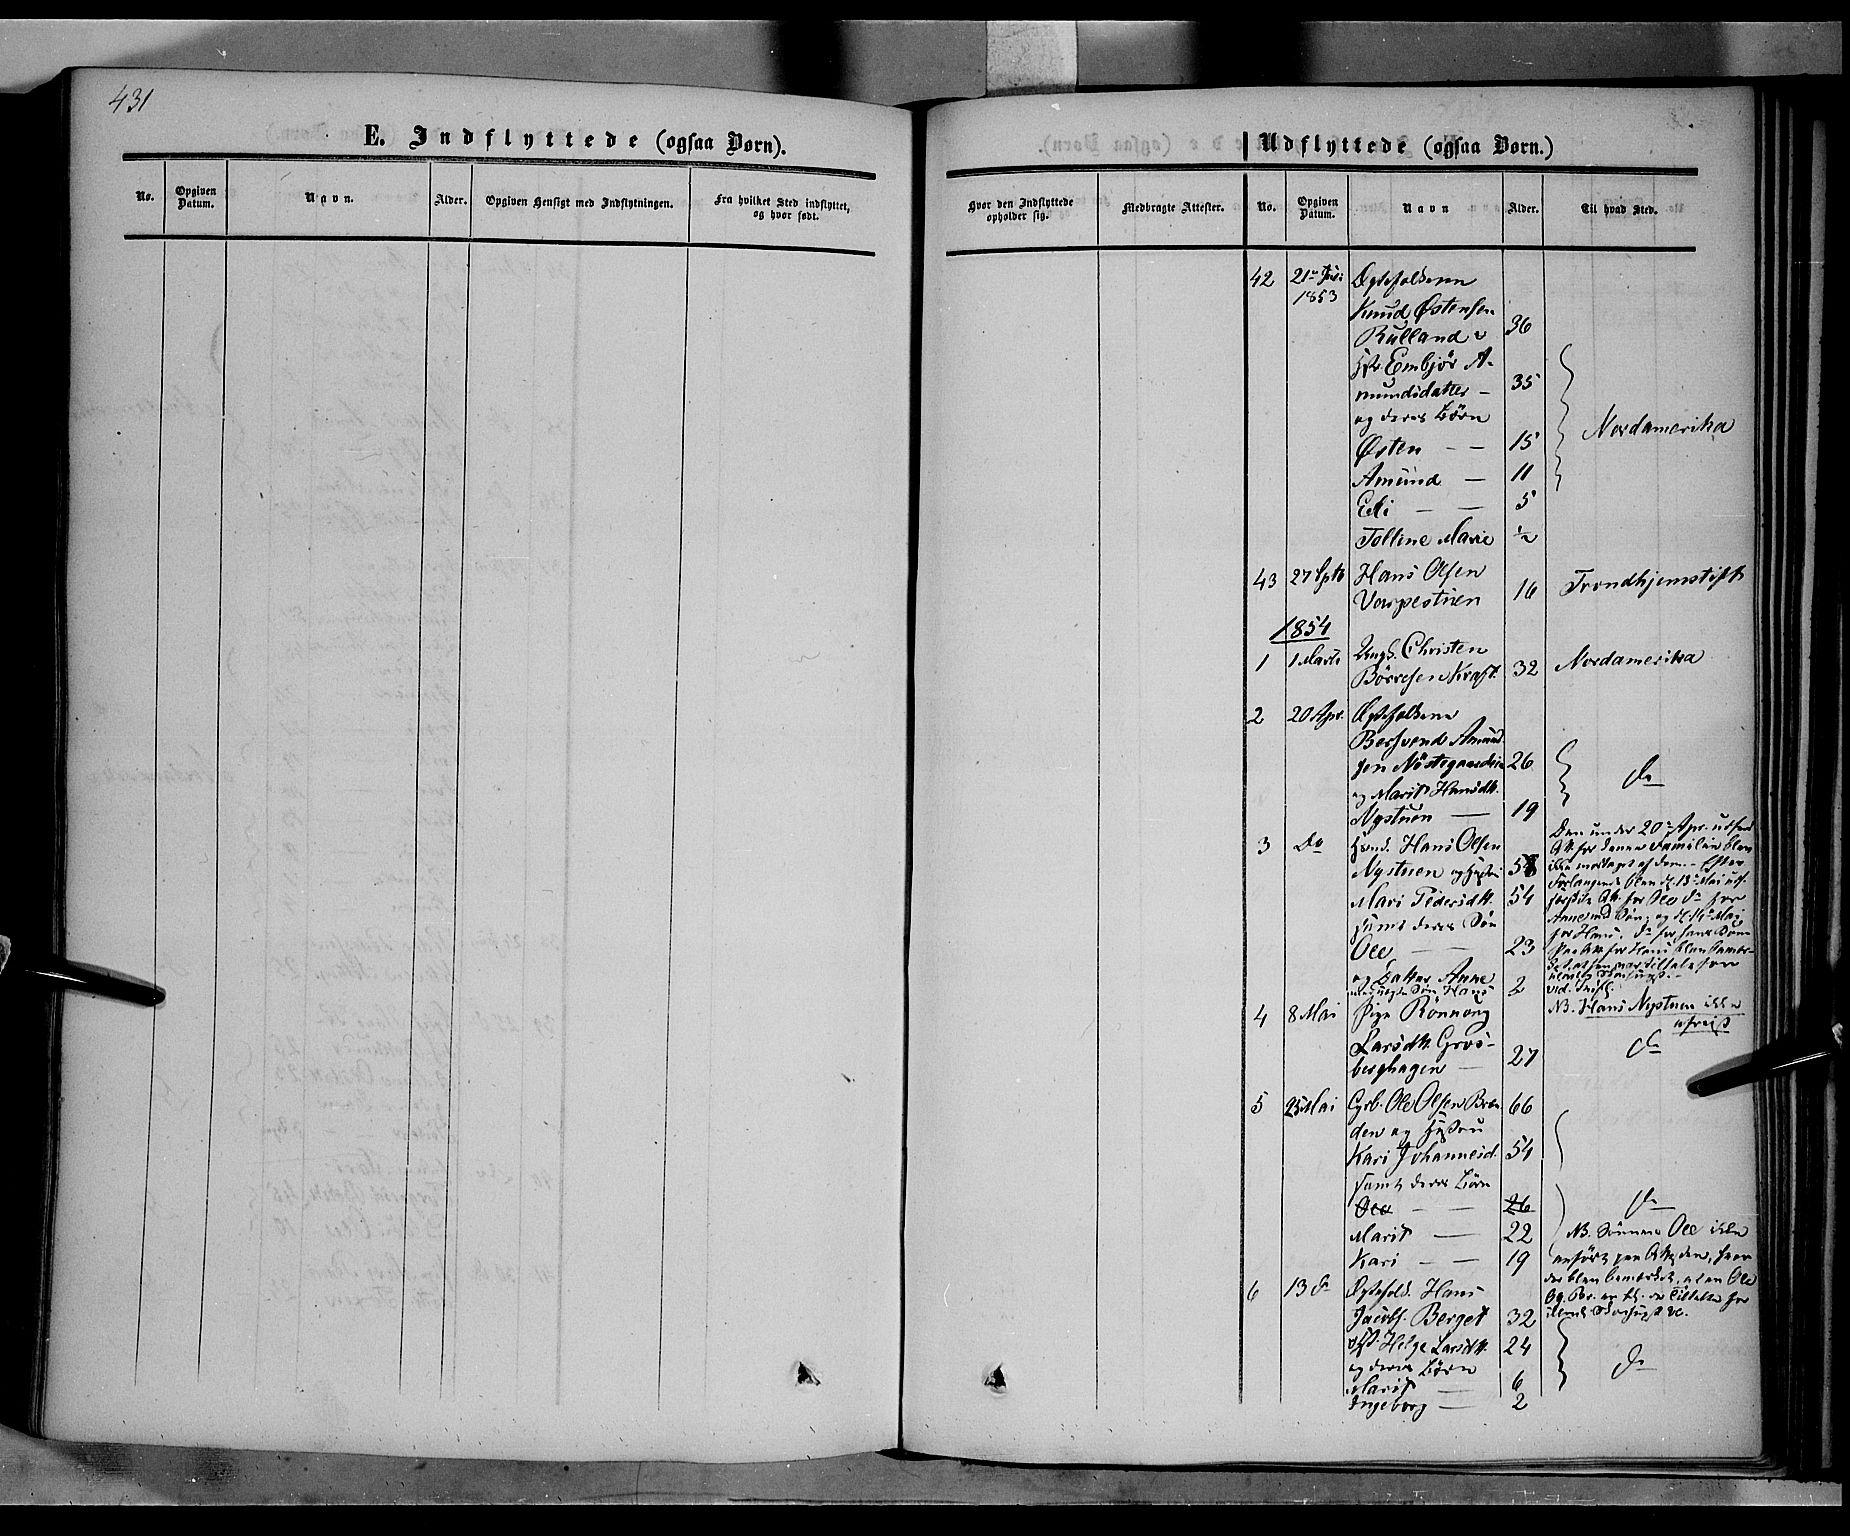 SAH, Nord-Fron prestekontor, Ministerialbok nr. 1, 1851-1864, s. 431